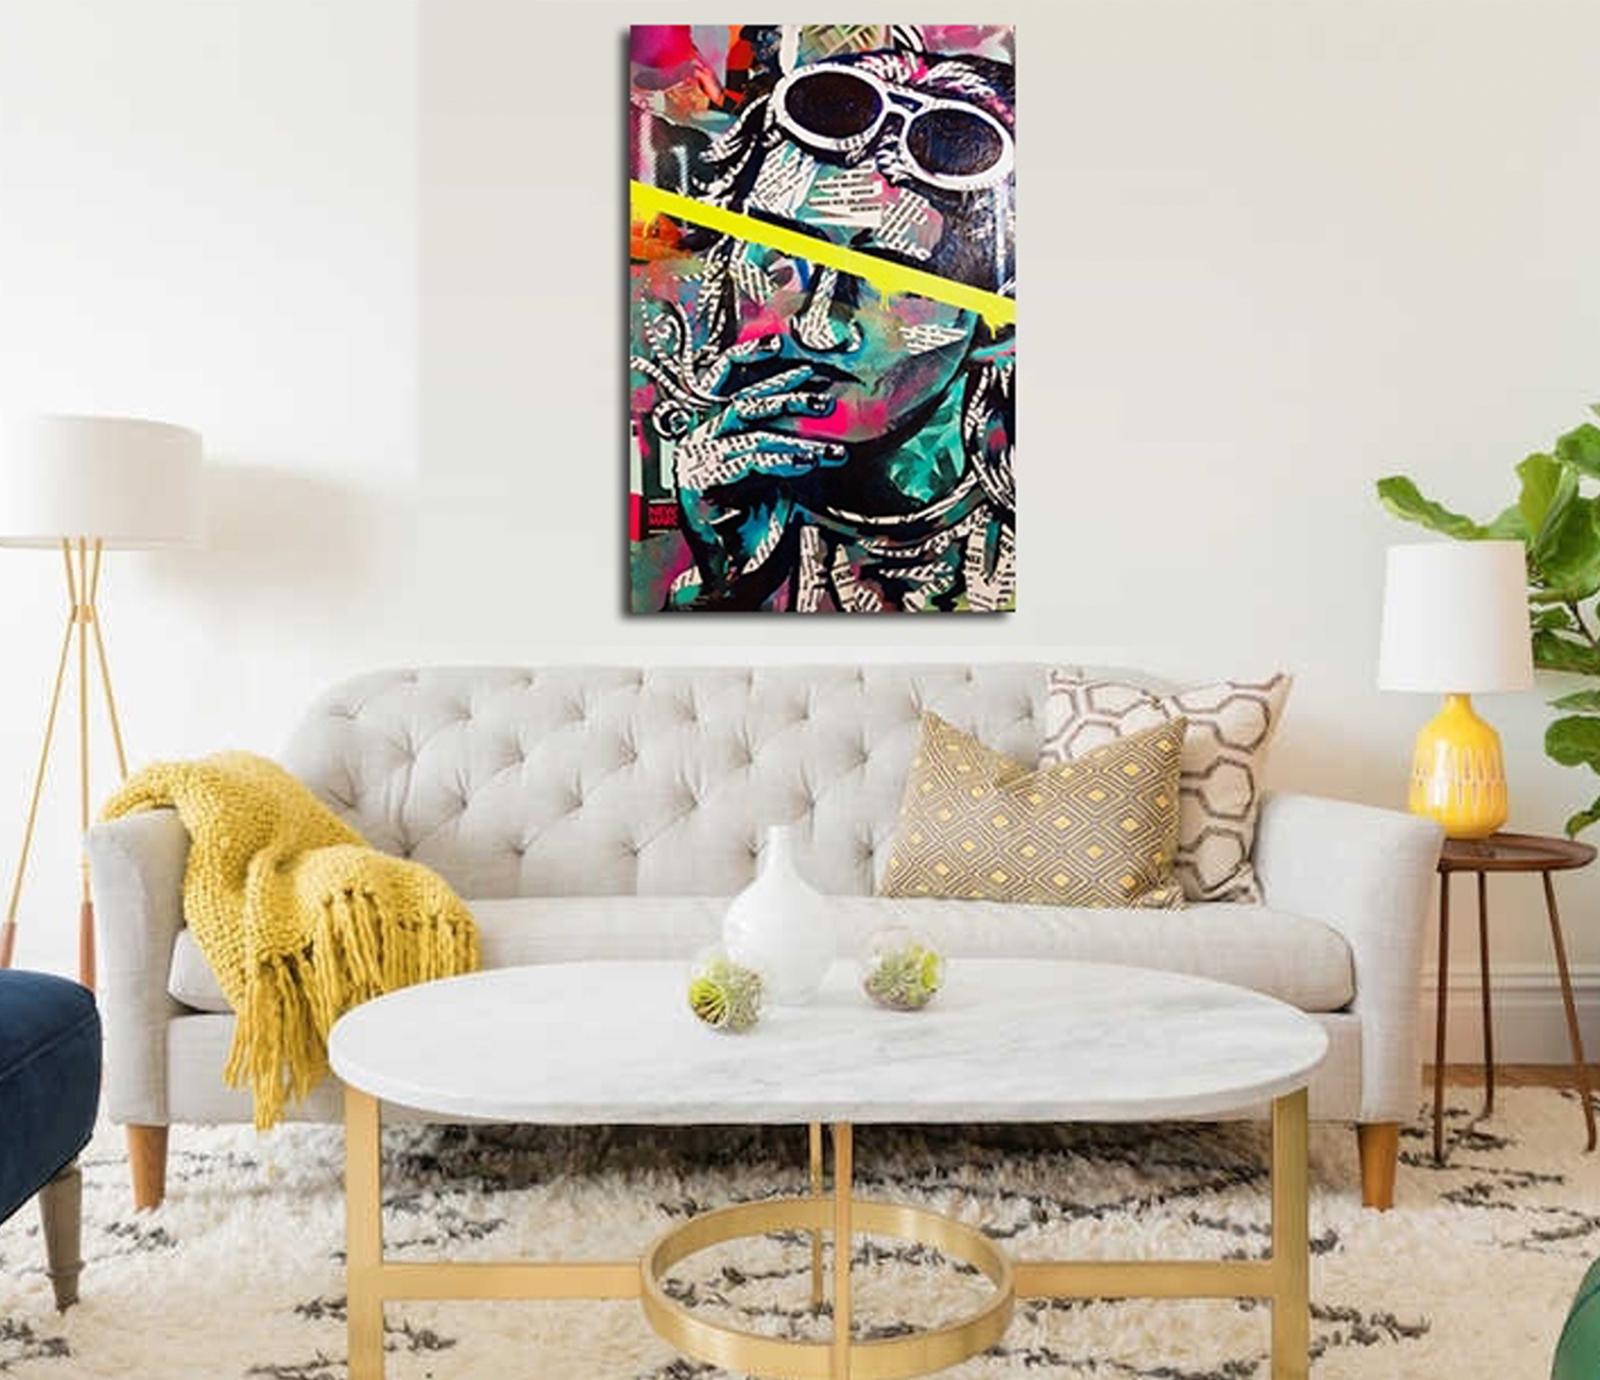 Living Room - Bianca Romero